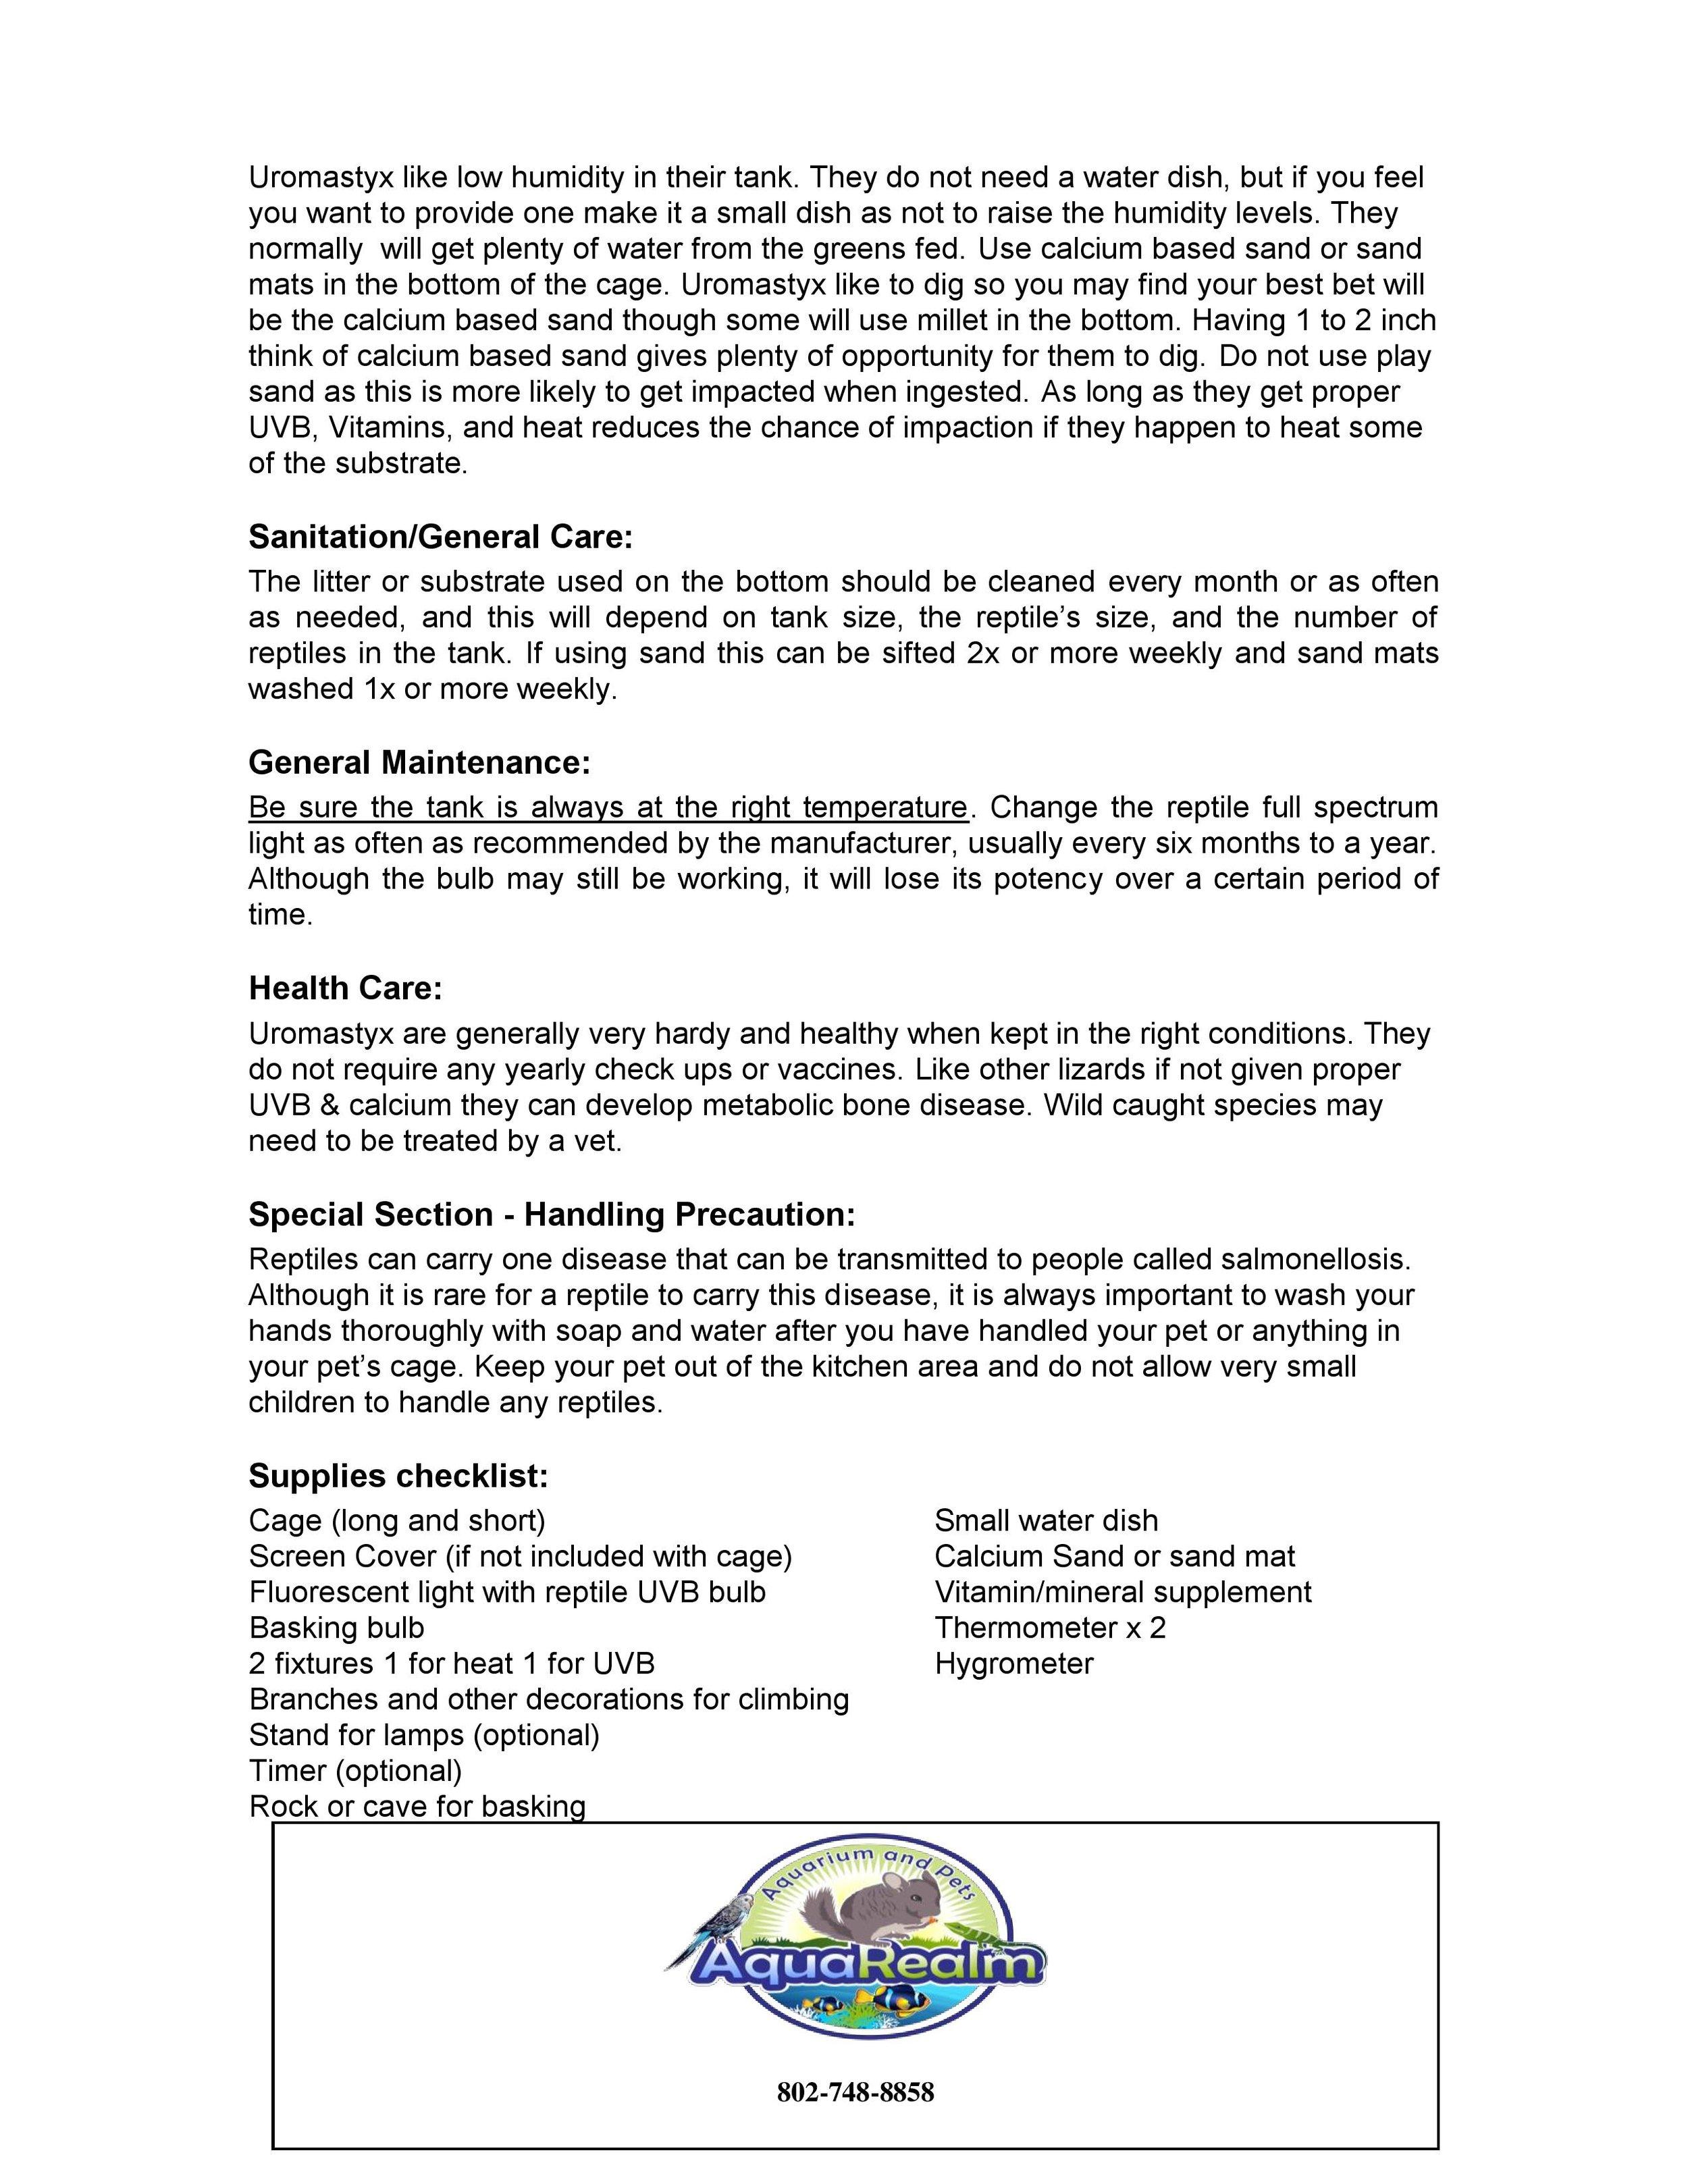 Uromastyx Care Sheet pg2